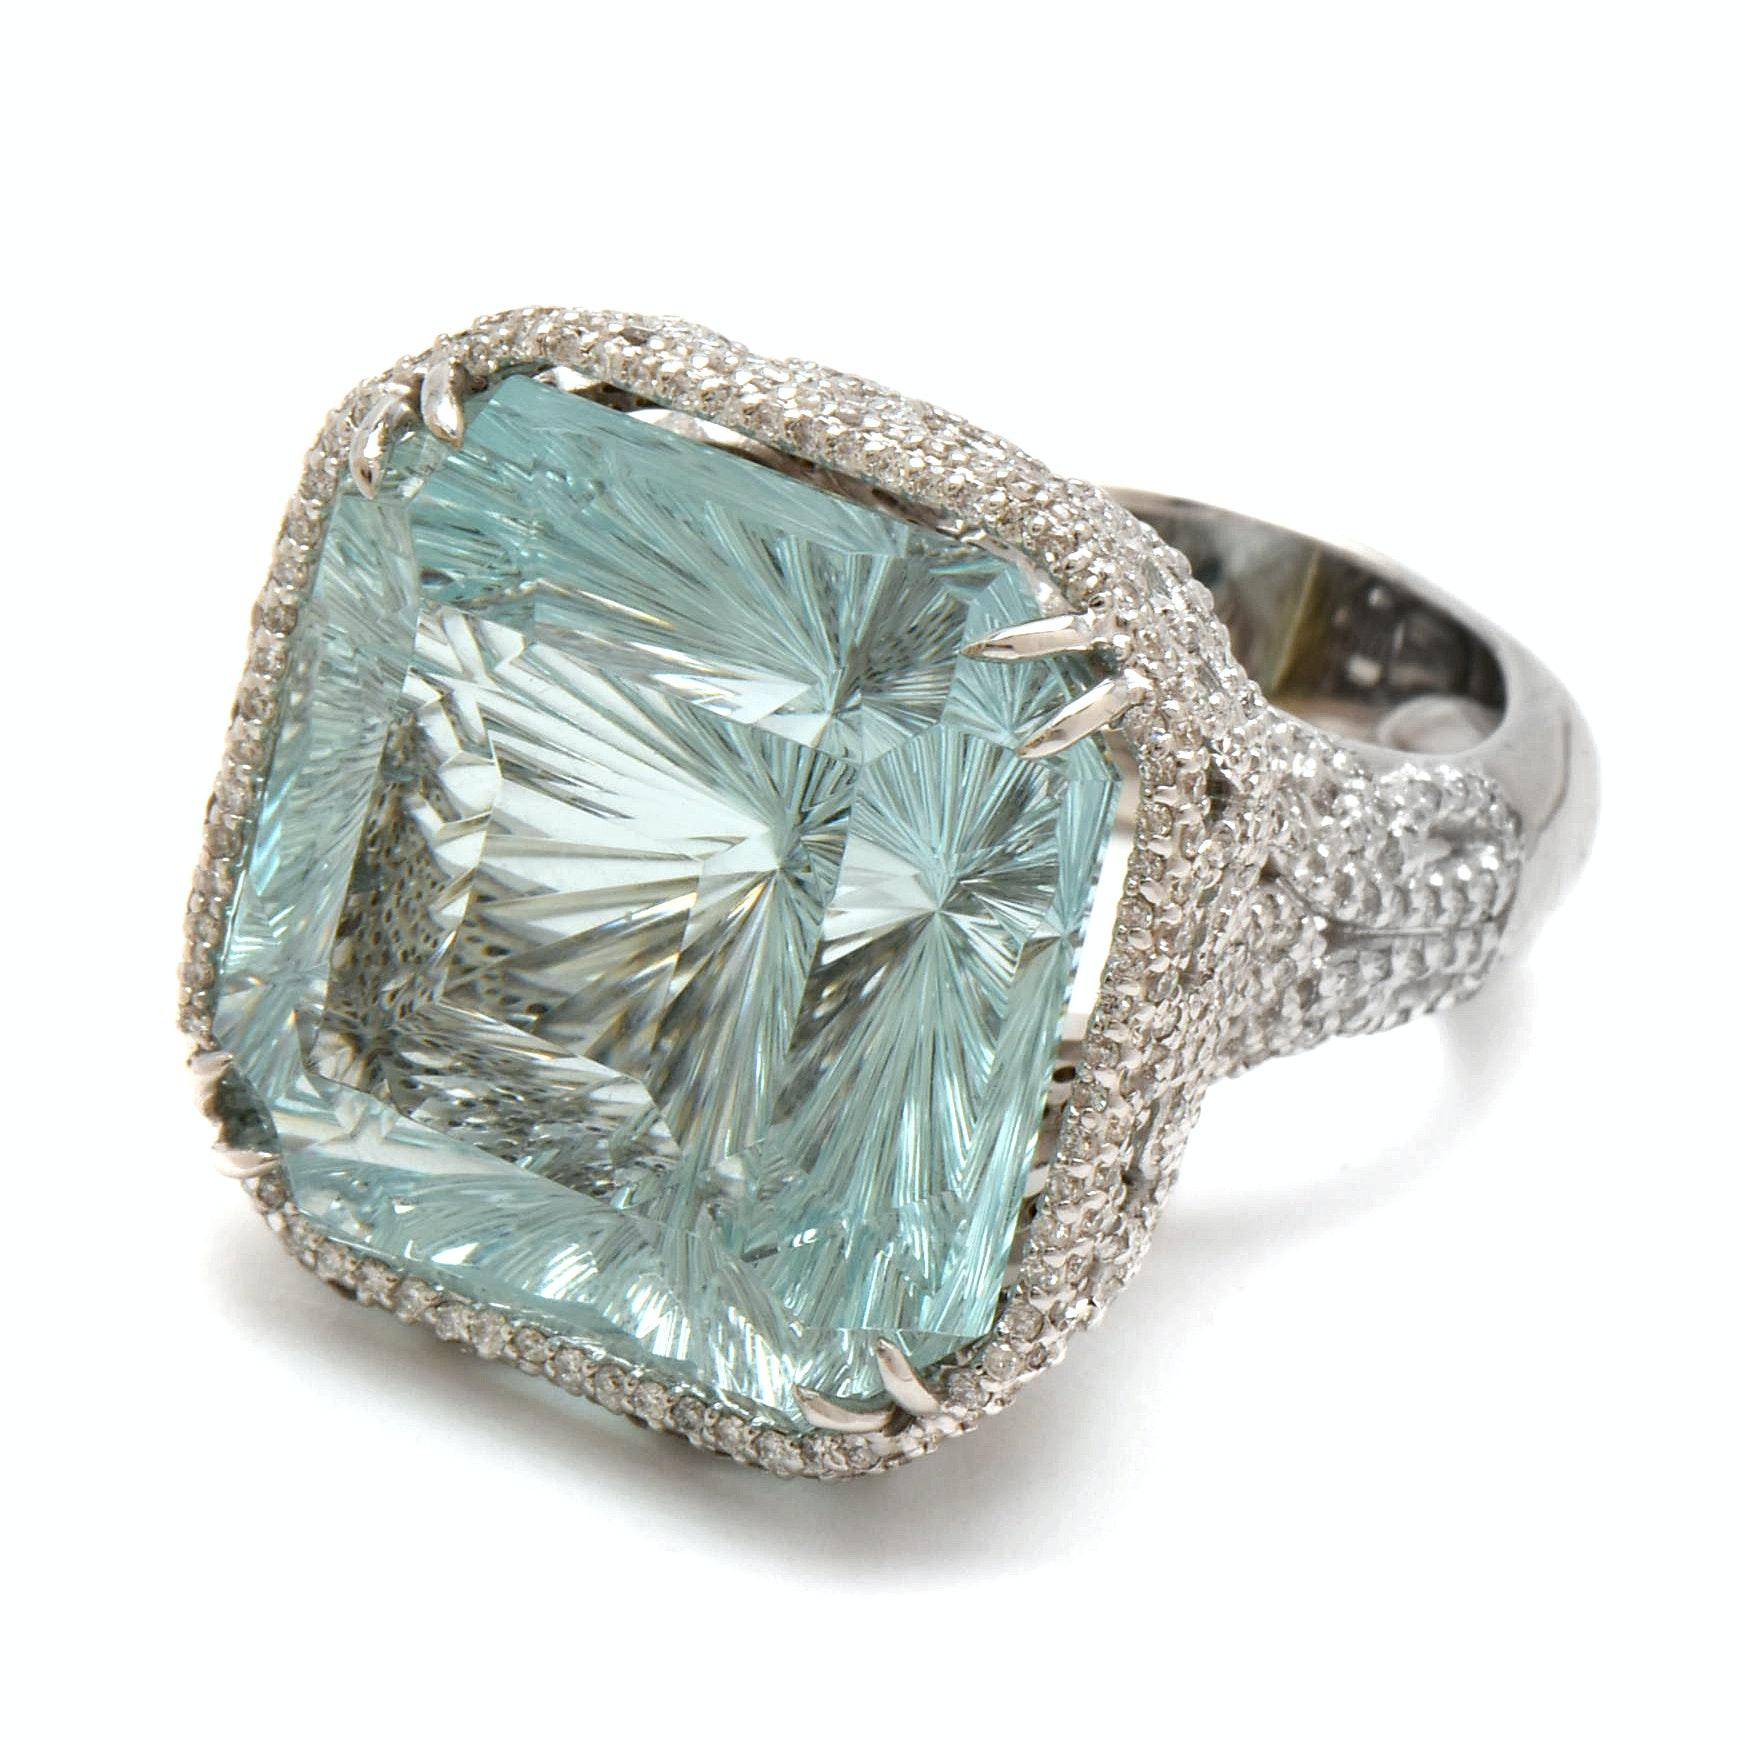 18K White Gold 51.14 CT Fantasy Cut Aquamarine and 3.05 CTW Diamond Ring